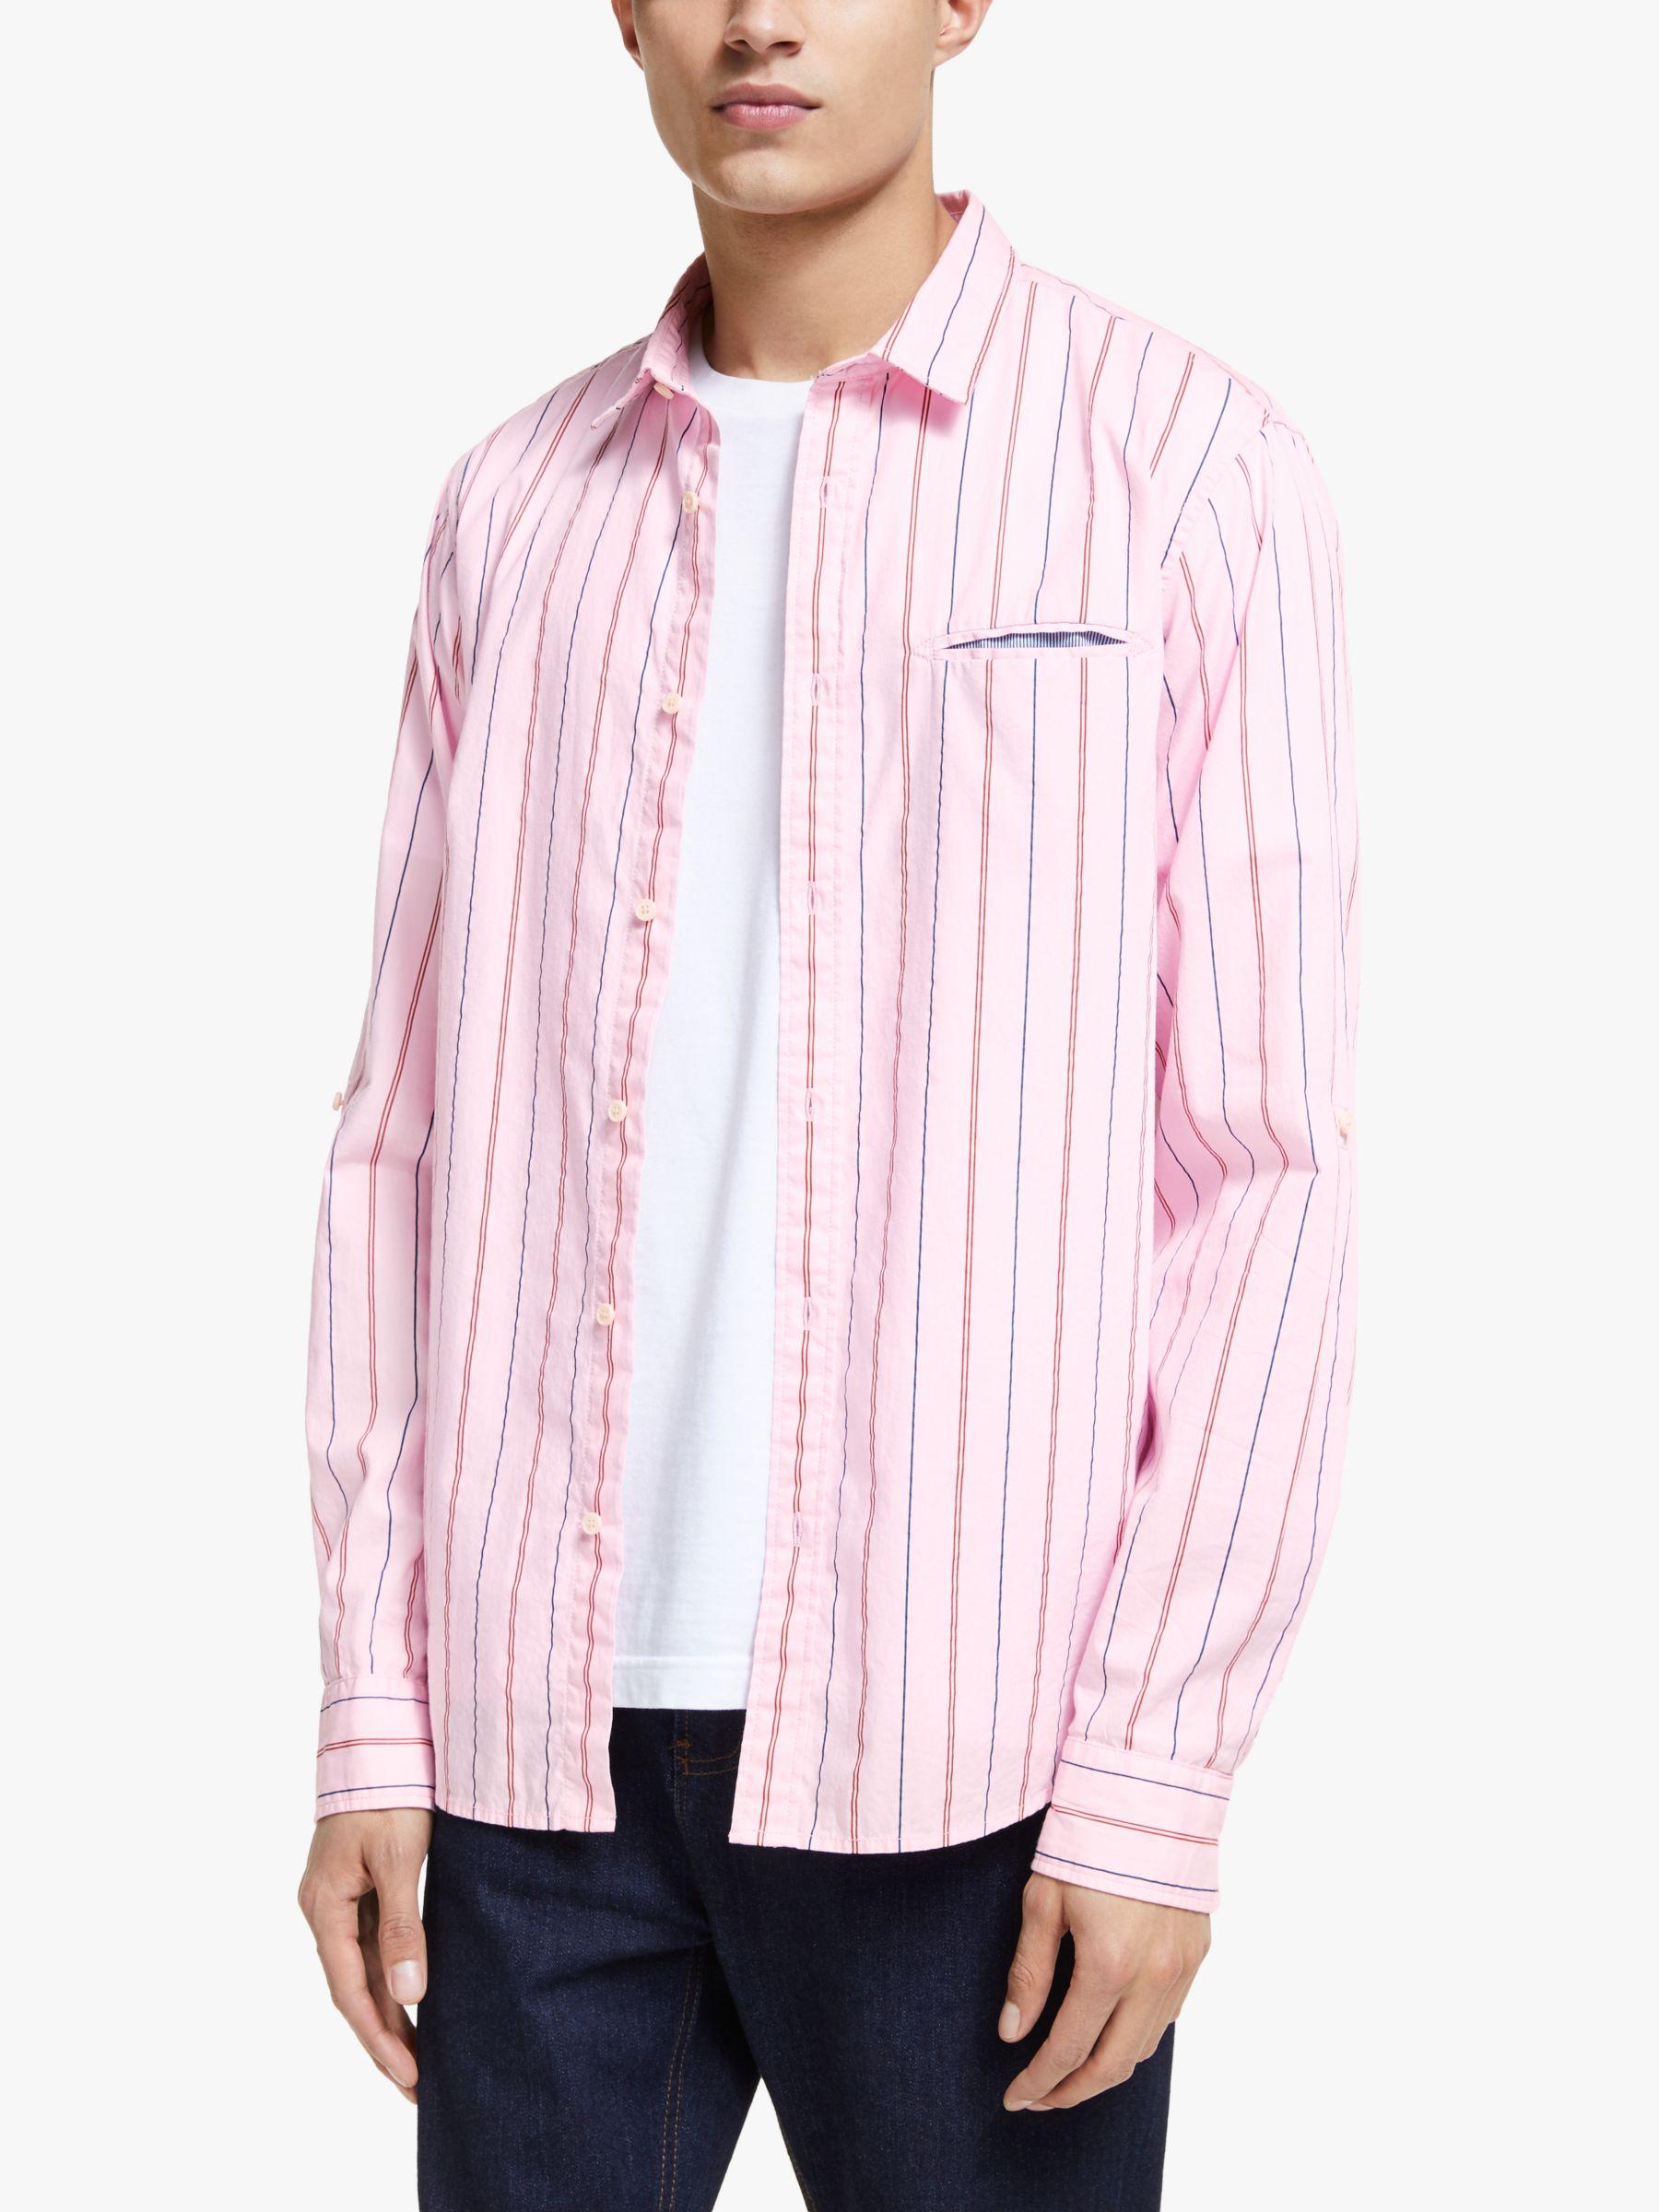 Scotch & Soda Scotch & Soda Classic Stripe & Pocket Shirt, Pink/Multi